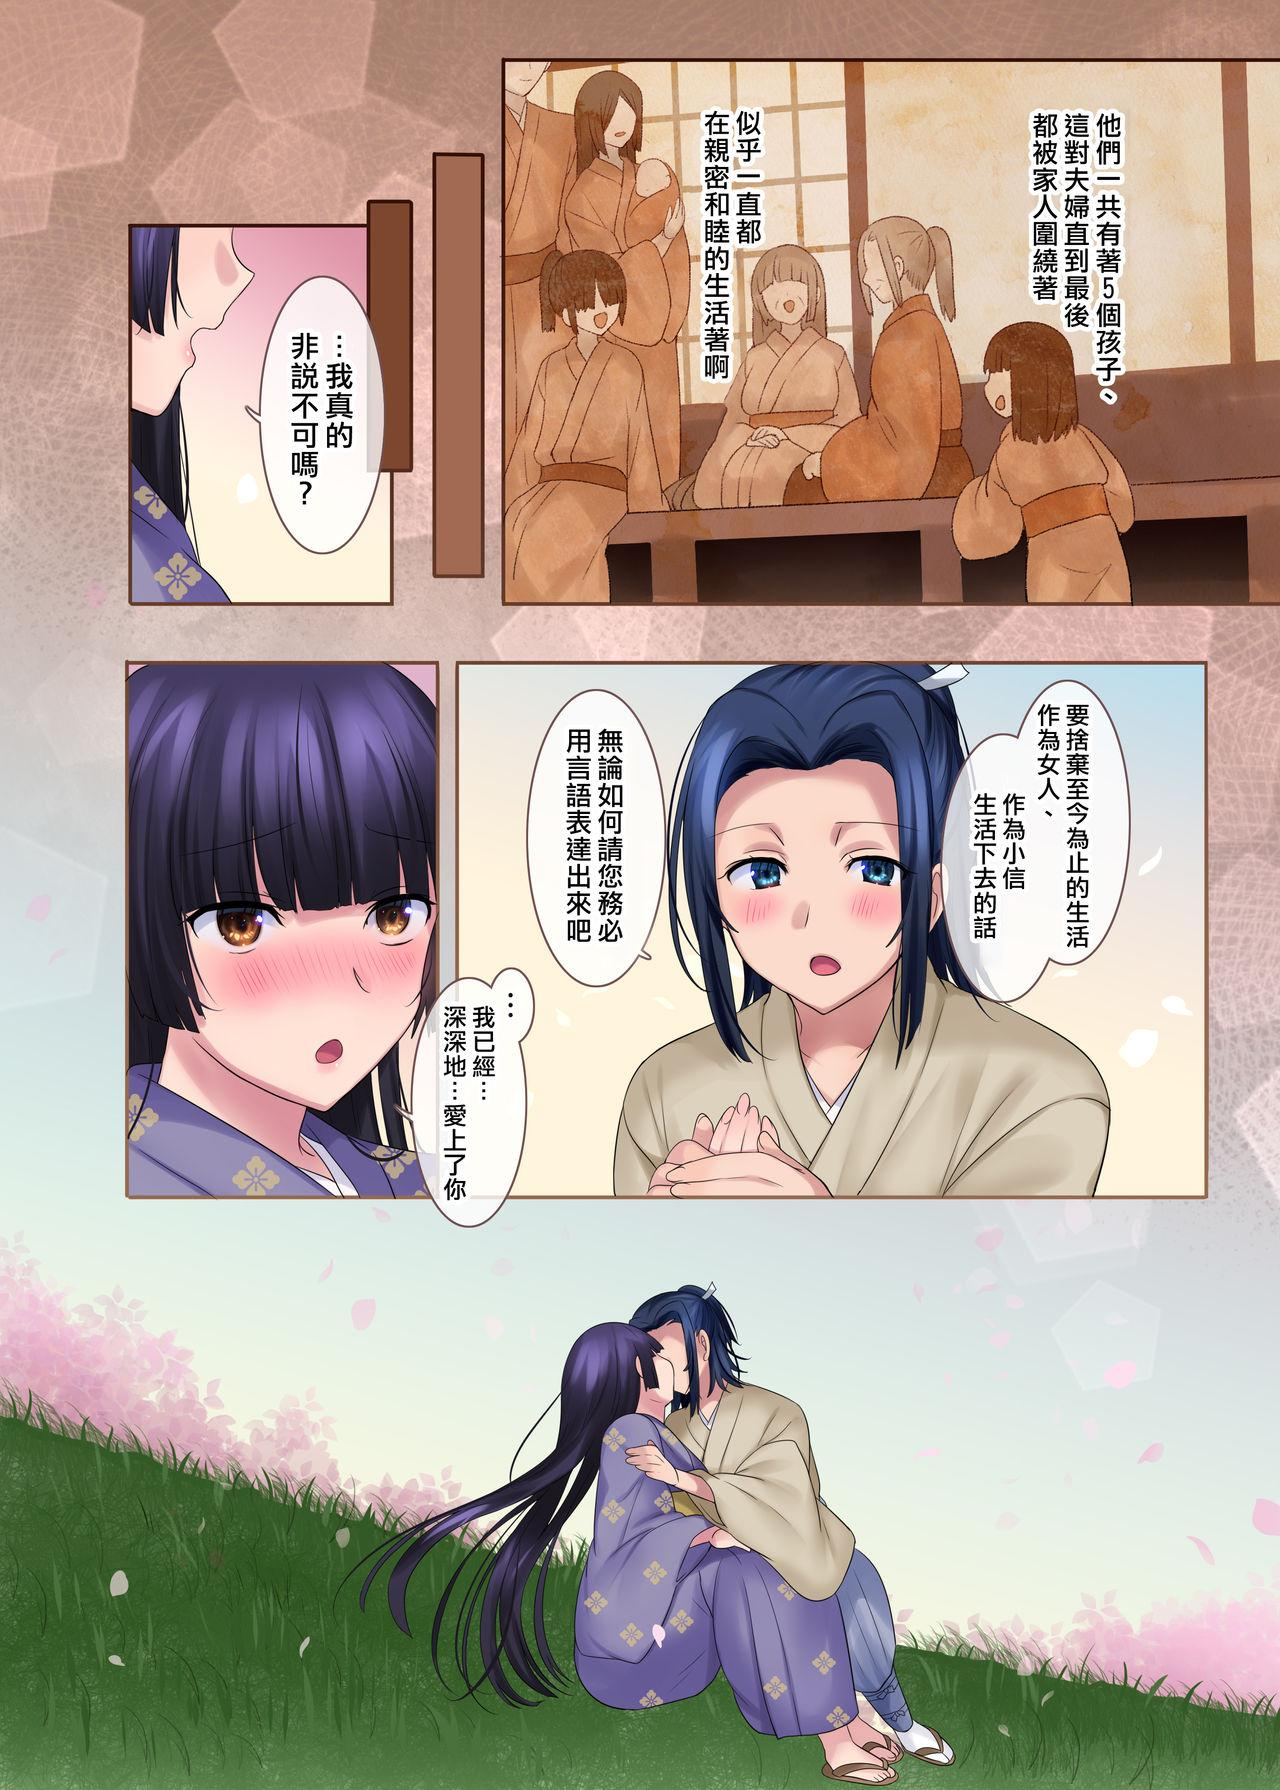 Nobunaga who was made a sexual change woman of Honnoji 43